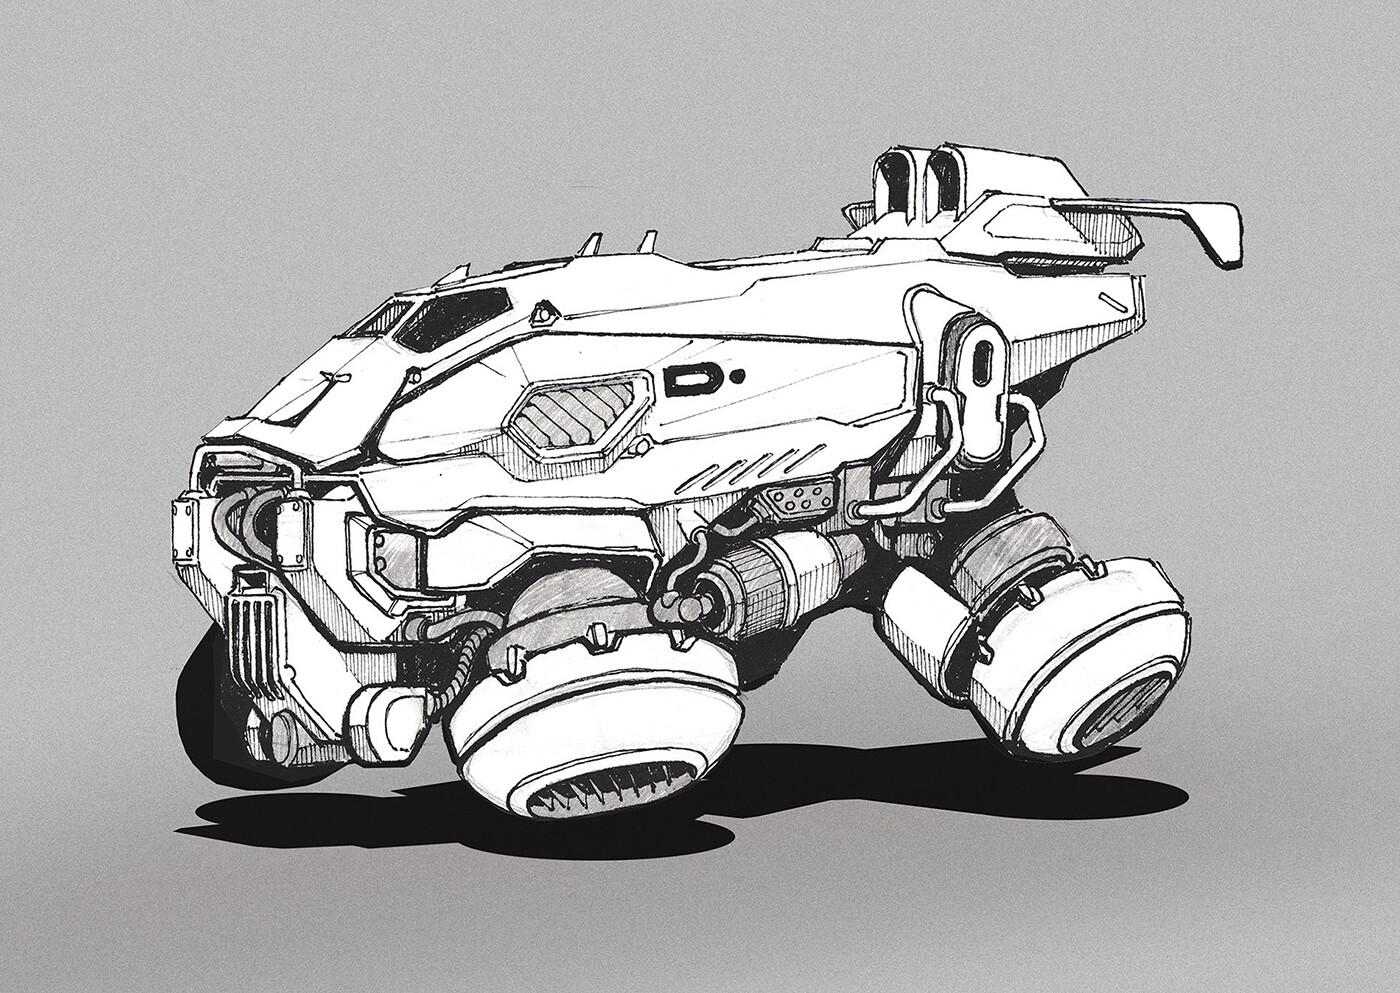 Heavy hovercraft concept